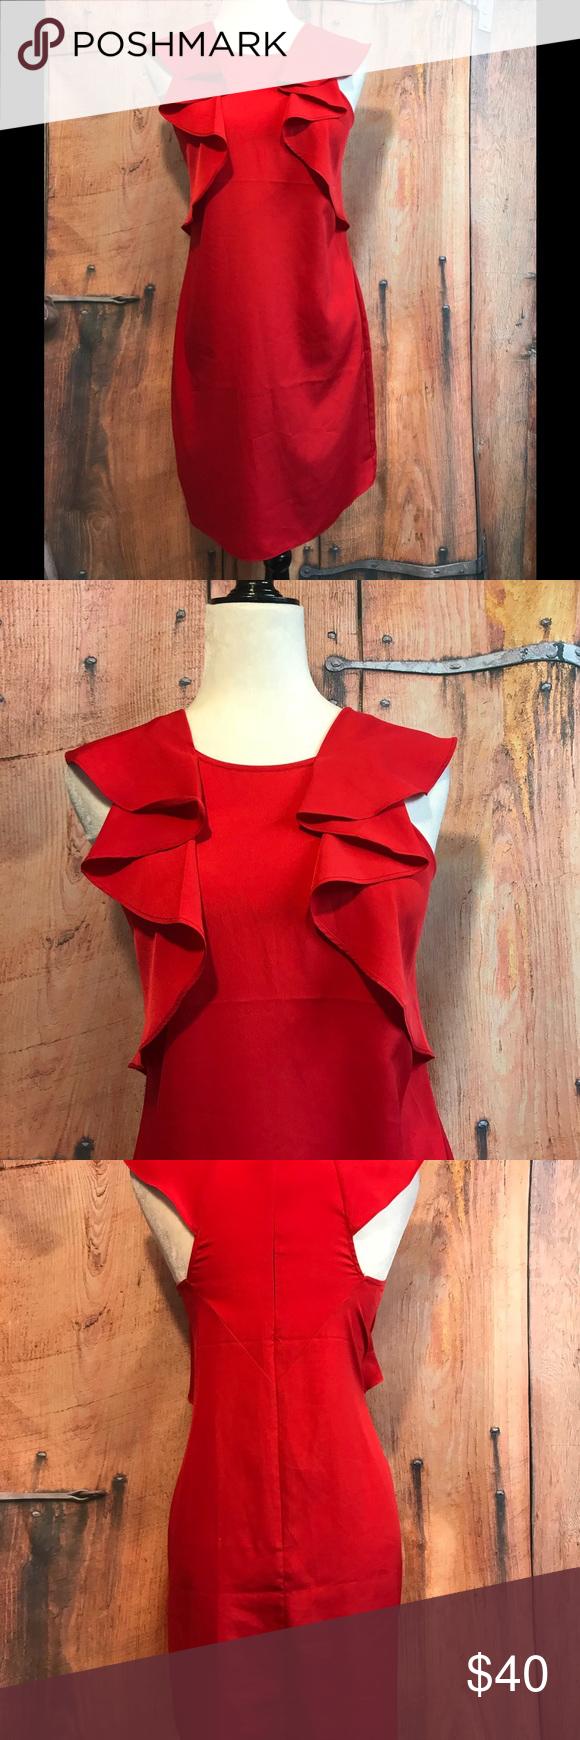 B1g1 Free Gorgeous Red Dress By C Stunning Dresses Dresses Red Dress [ 1740 x 580 Pixel ]